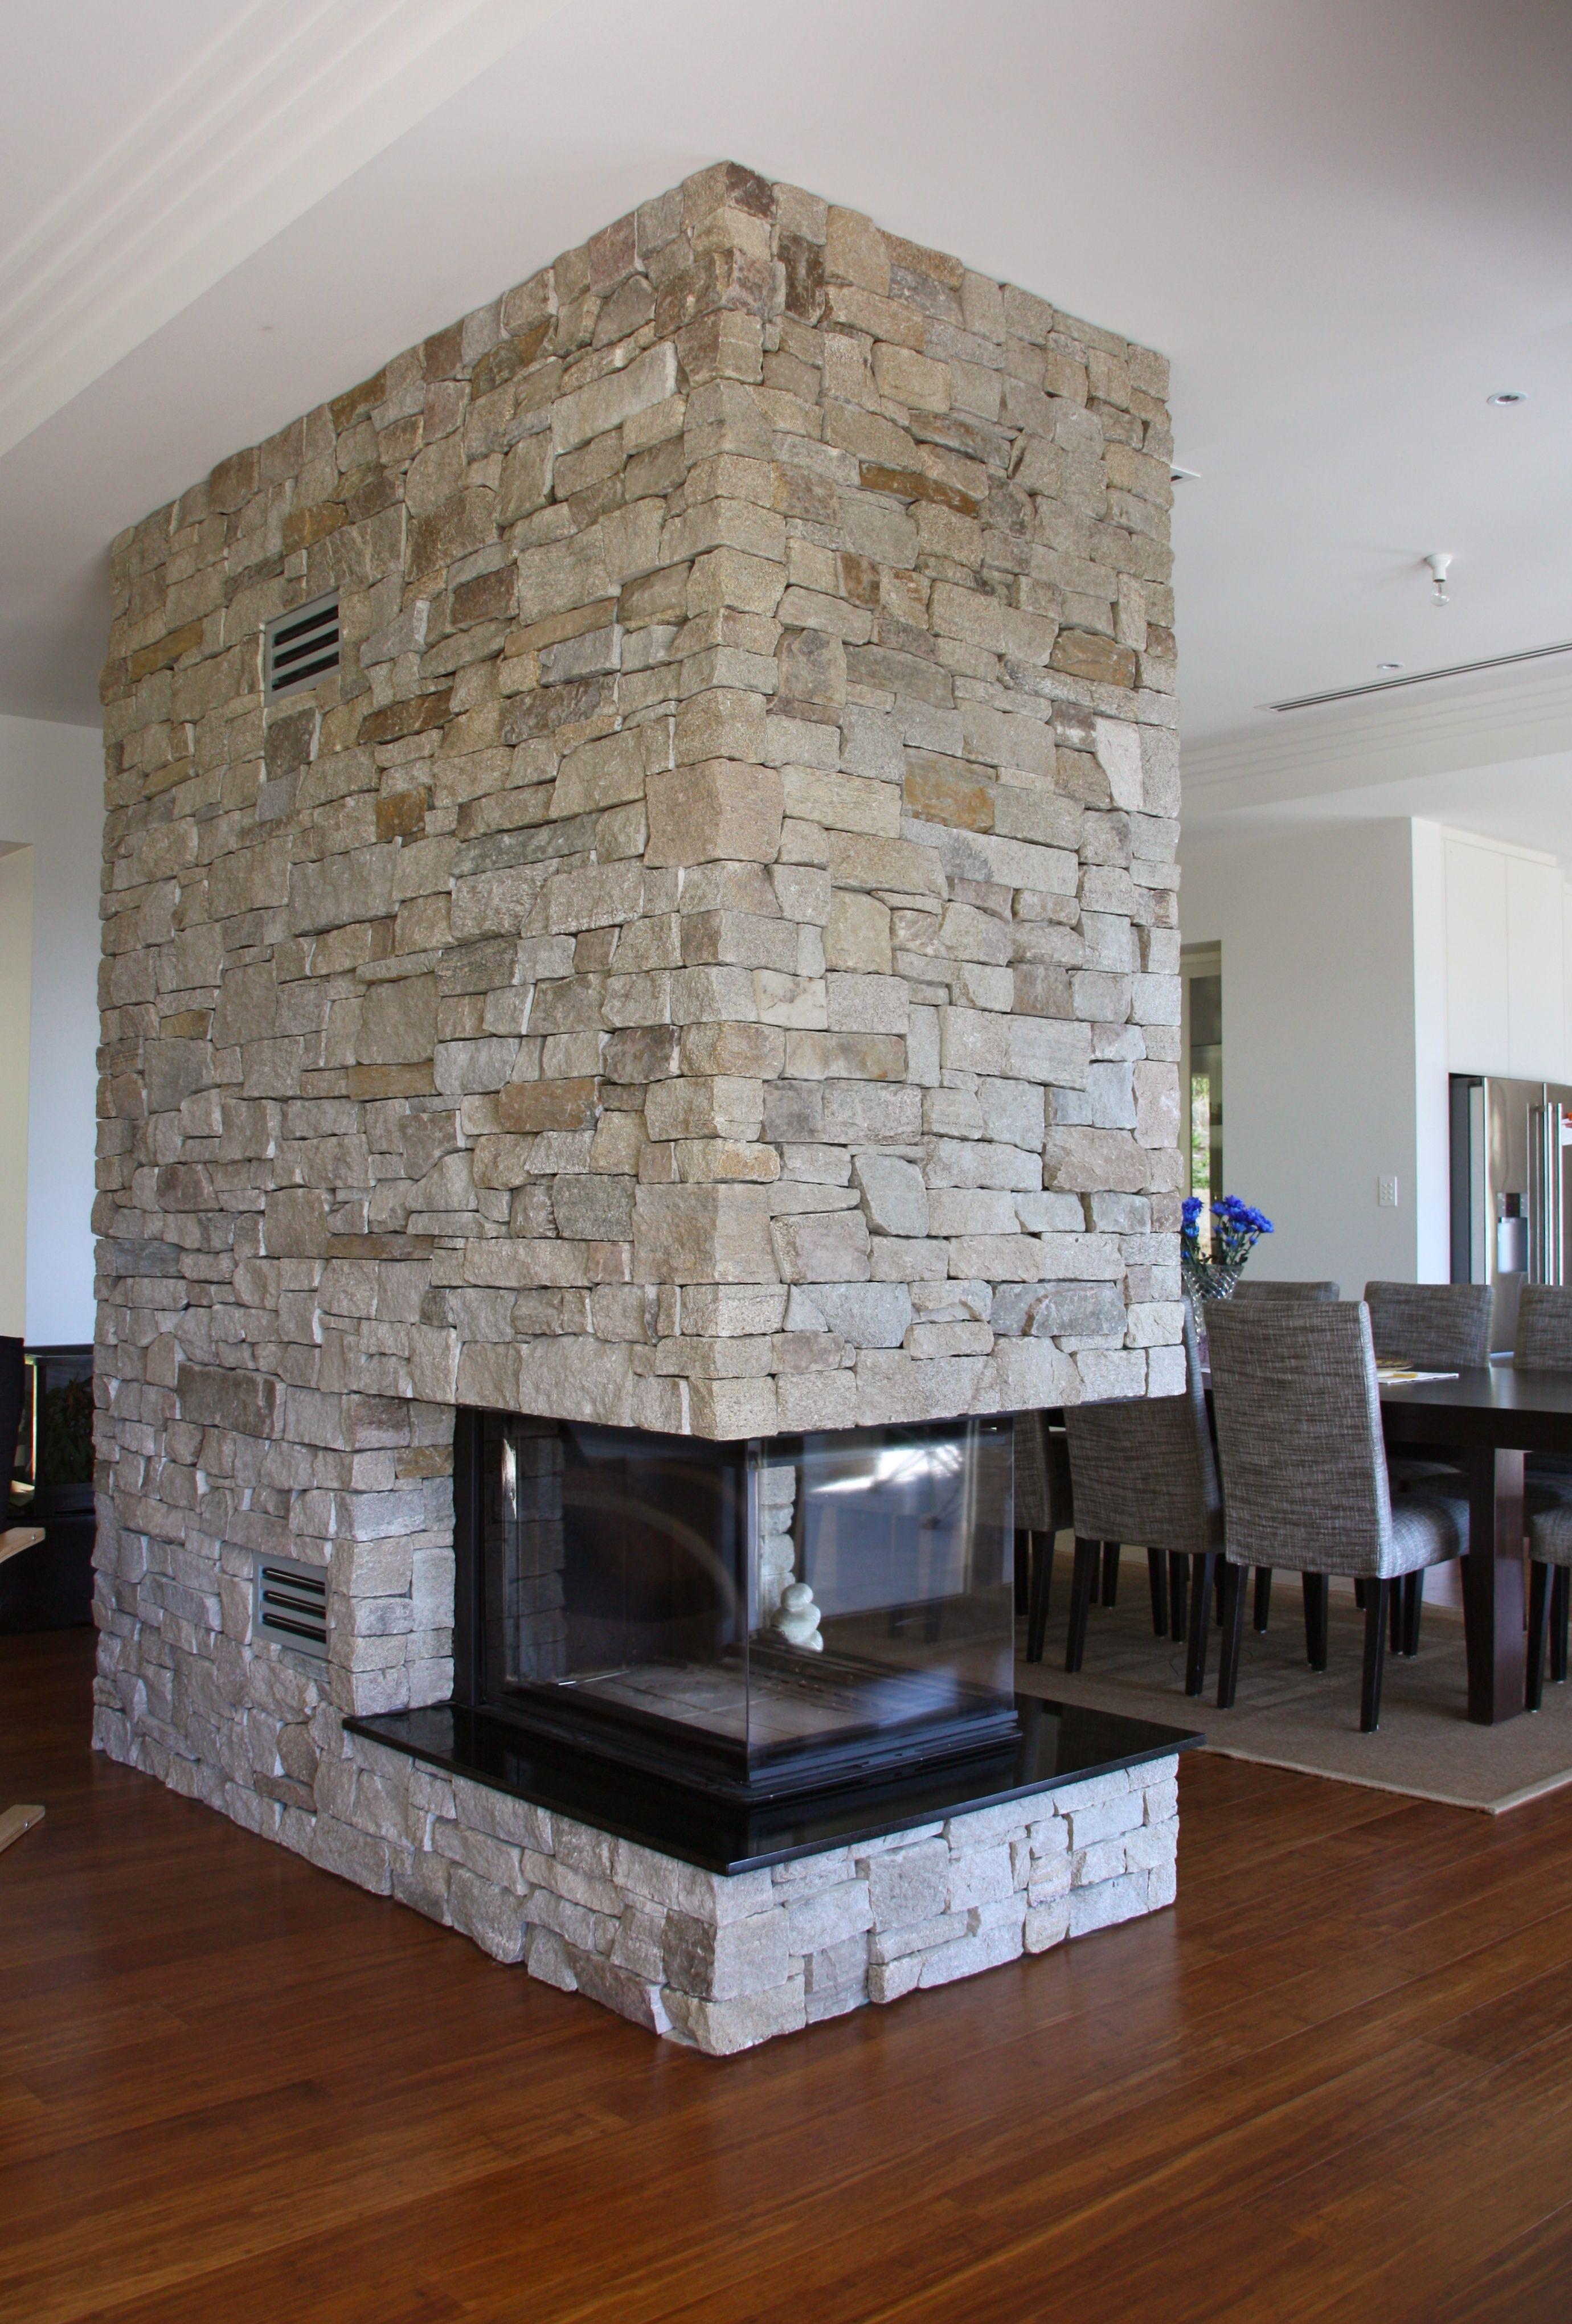 eco outdoor alpine dry stone walling on indoor blade wall  - eco outdoor alpine dry stone walling on indoor blade wall fireplace ecooutdoor  endless